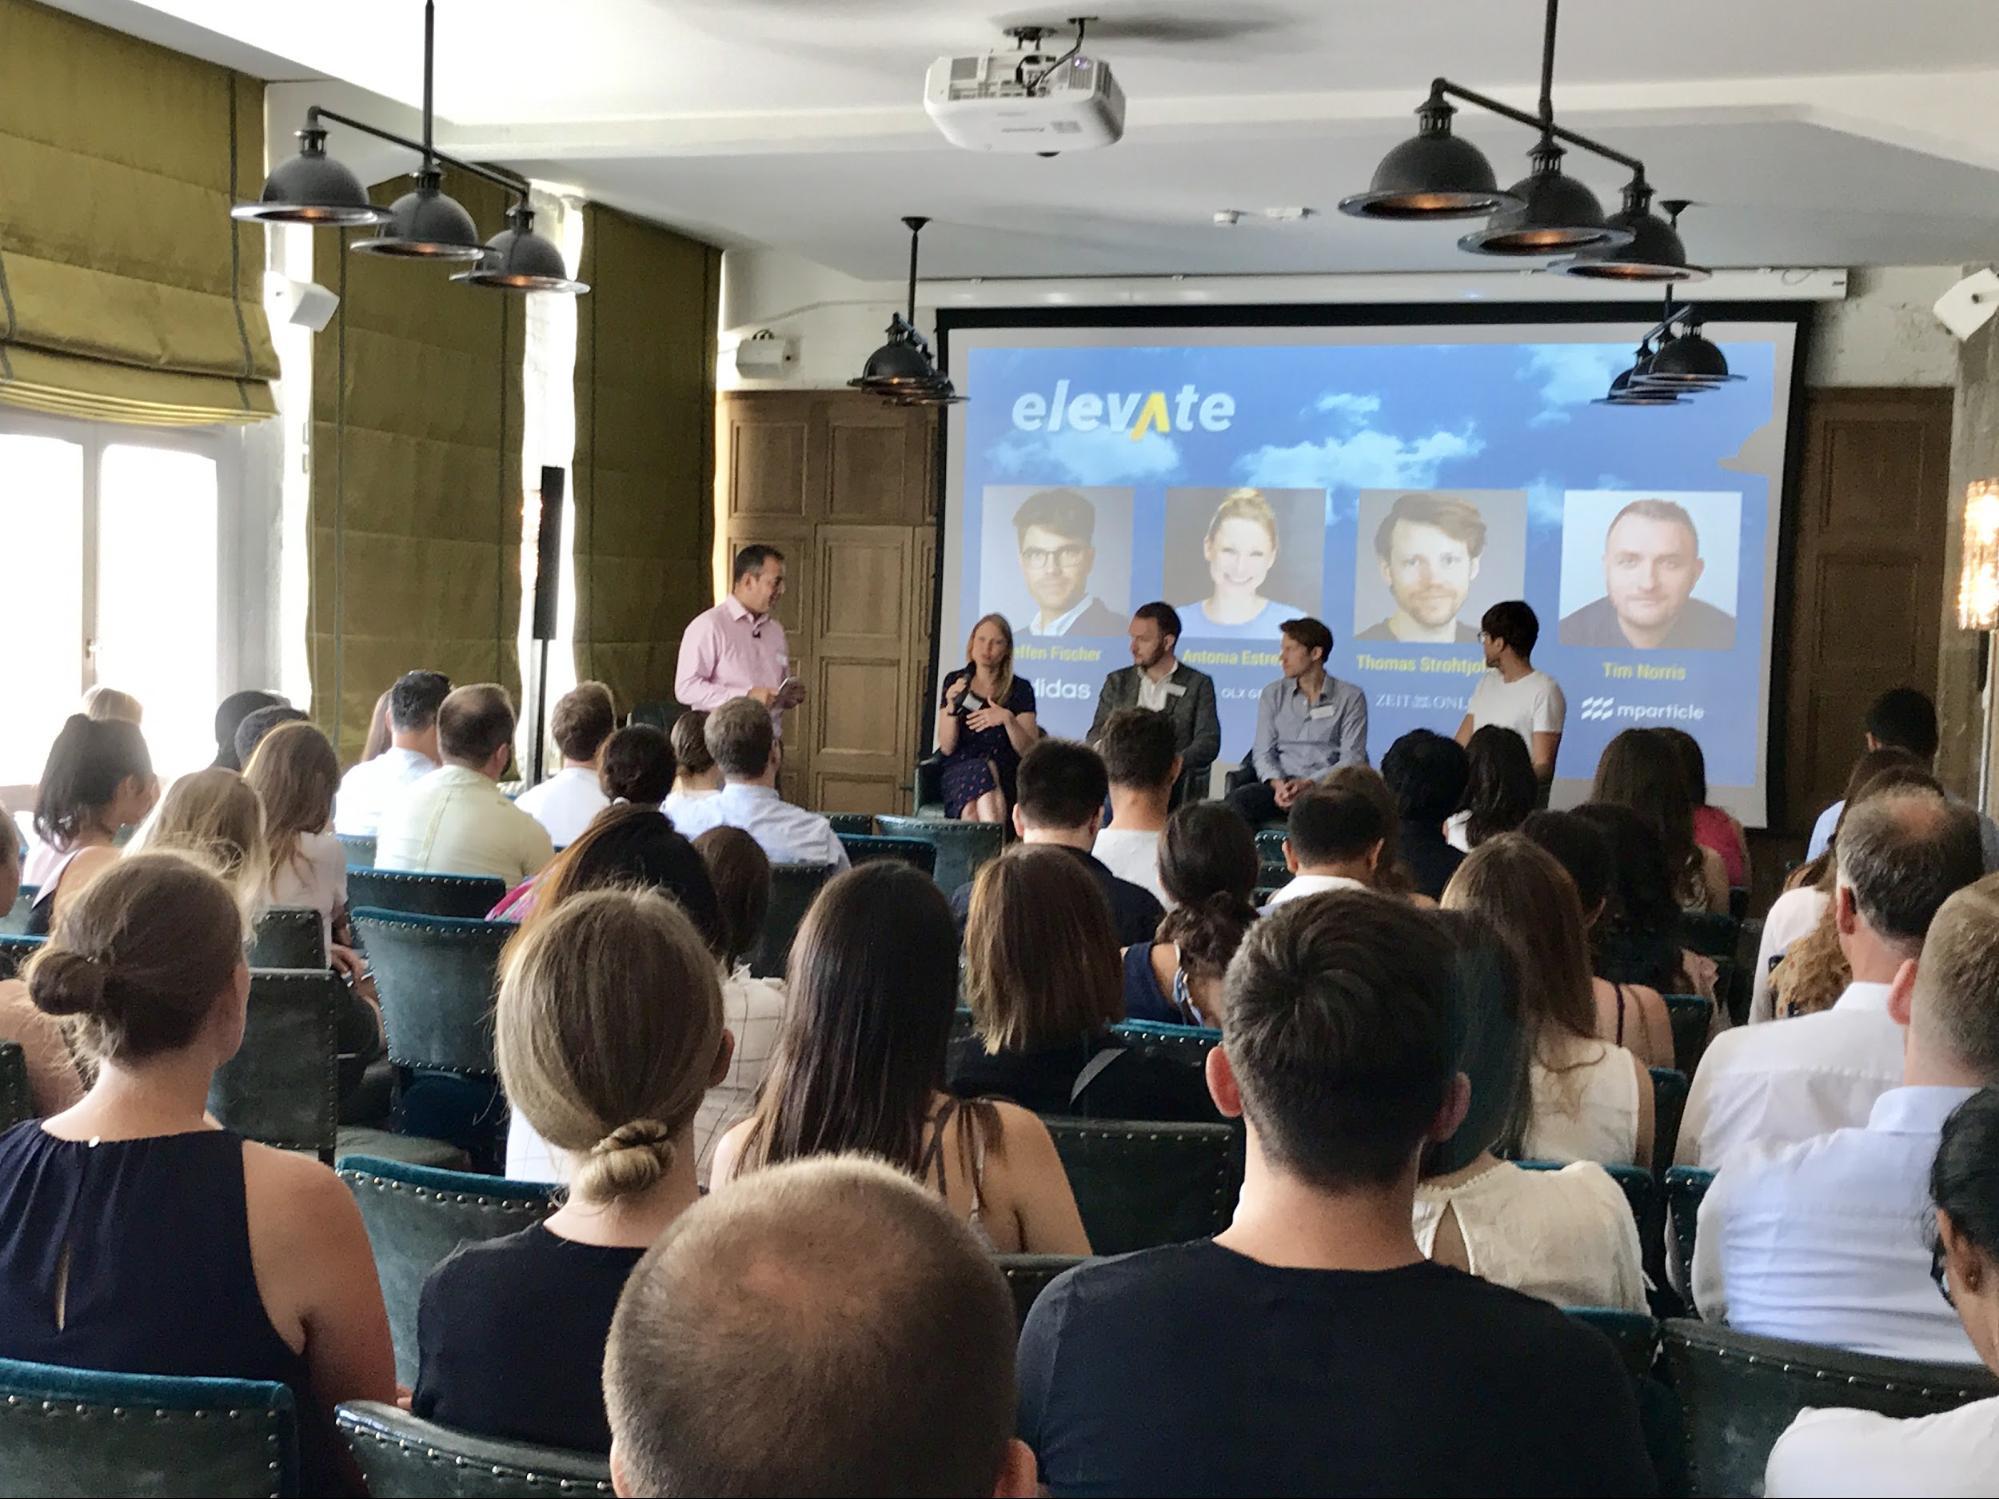 berlin-digital-engagement-forum-panelists